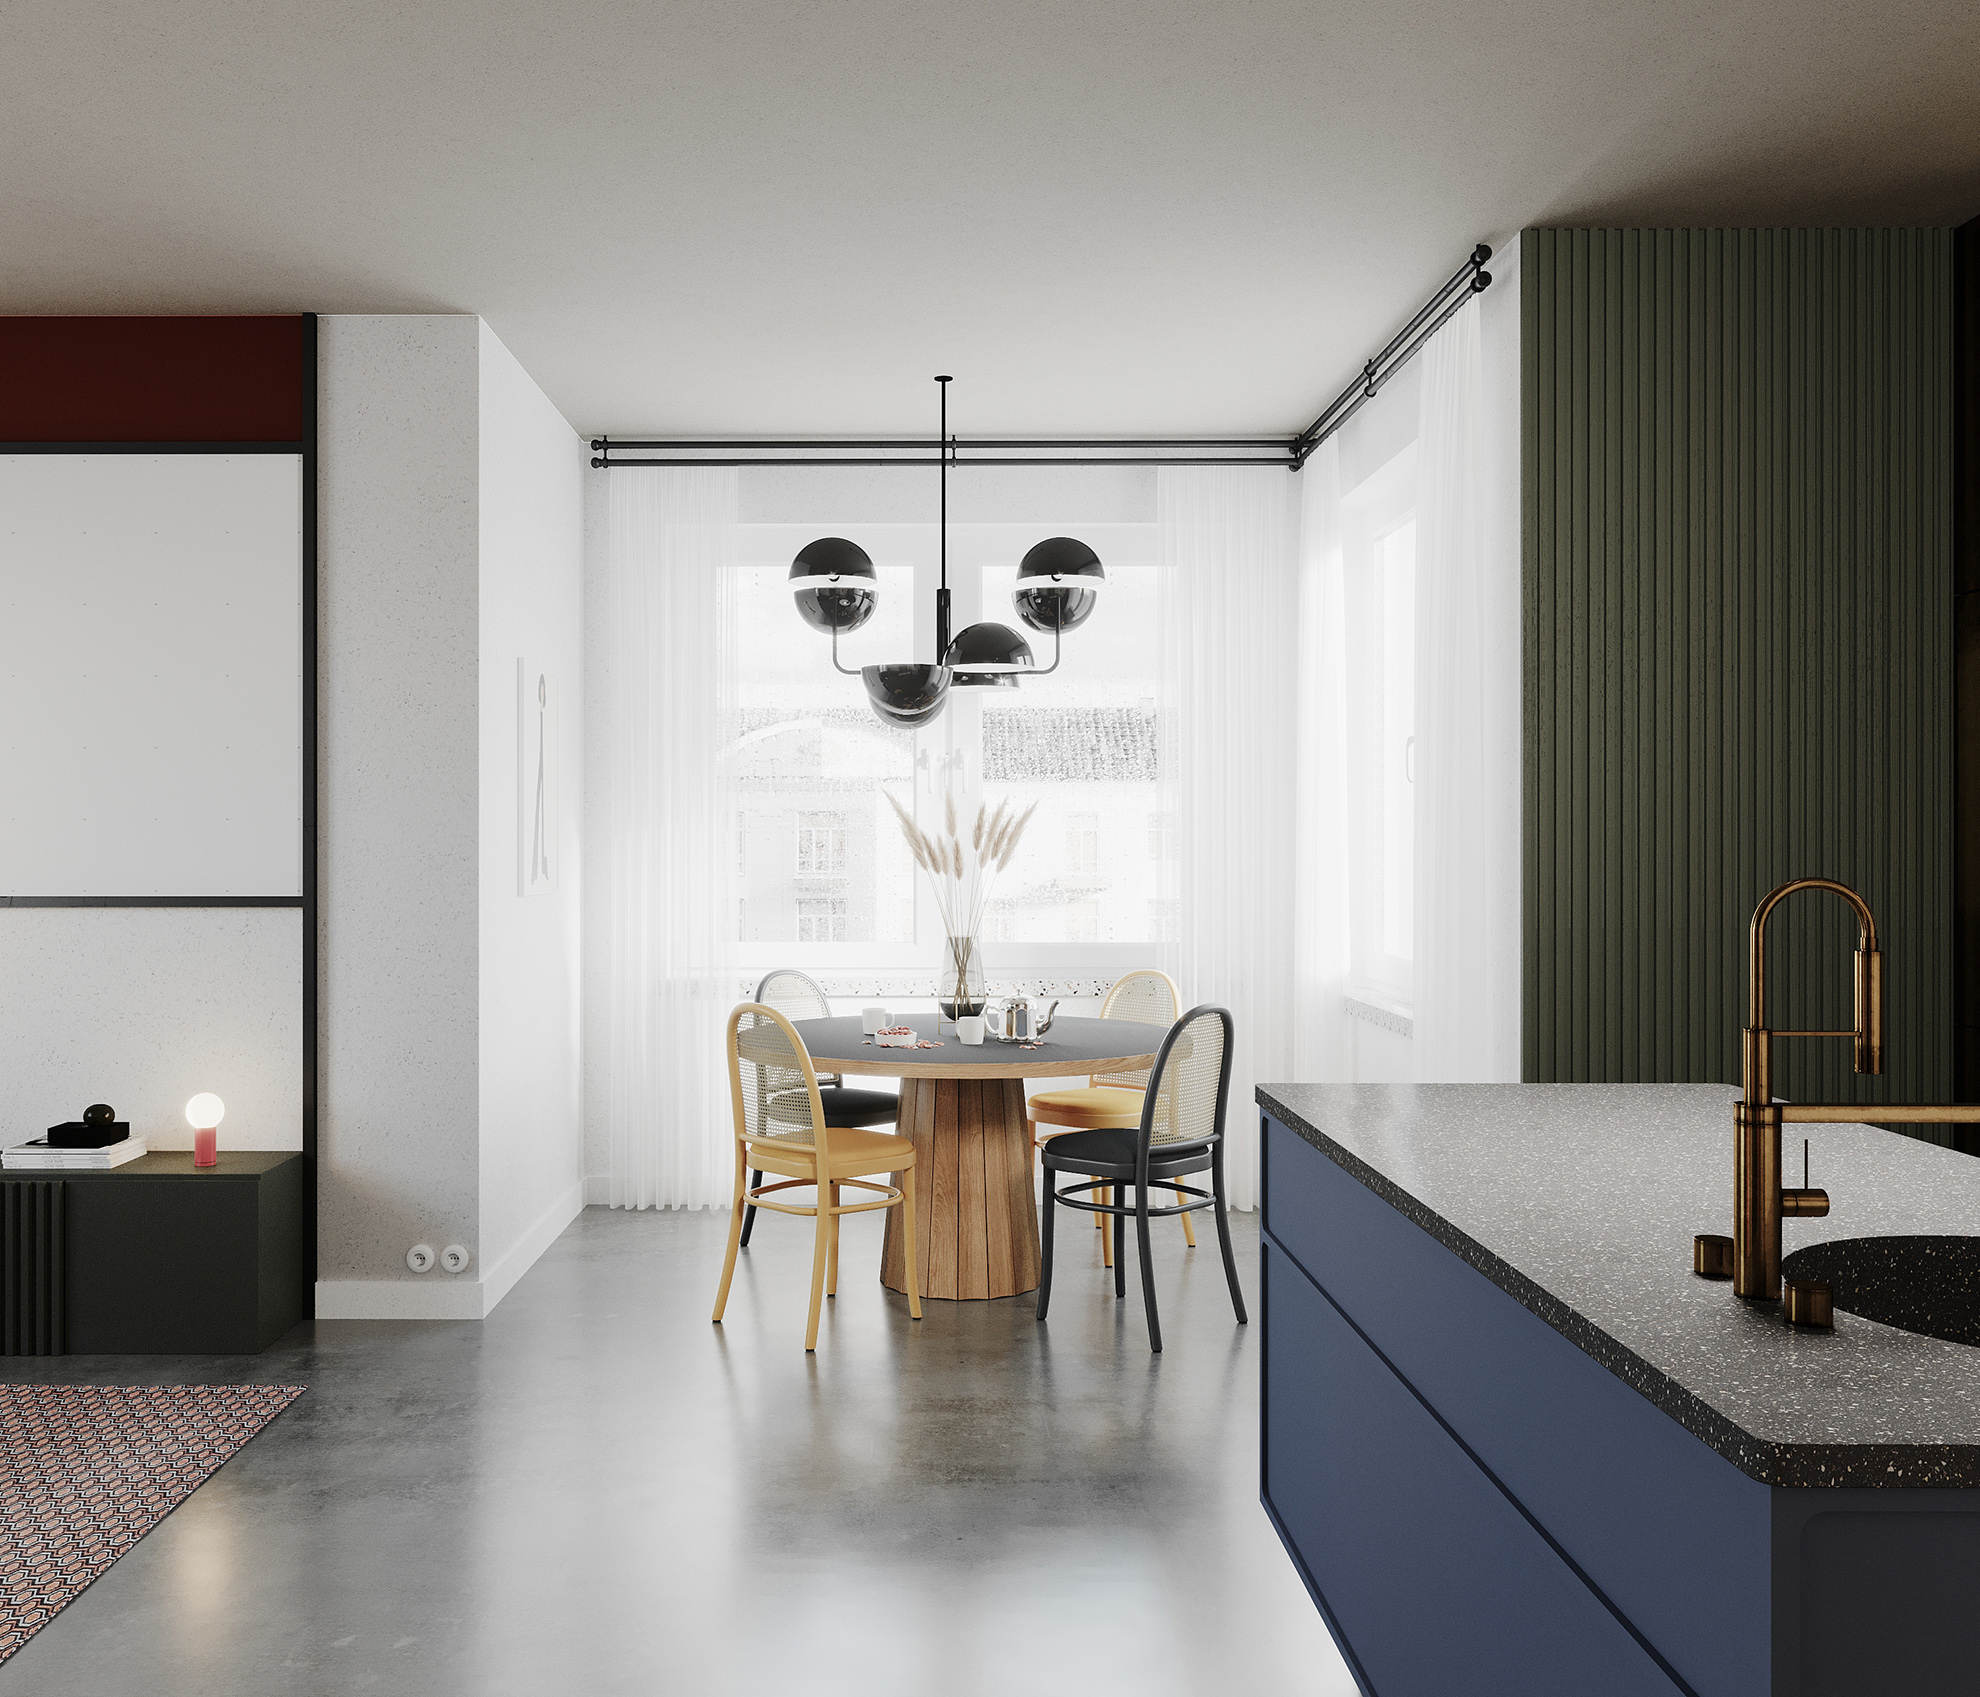 Mieszkanie inspirowane modernizmem